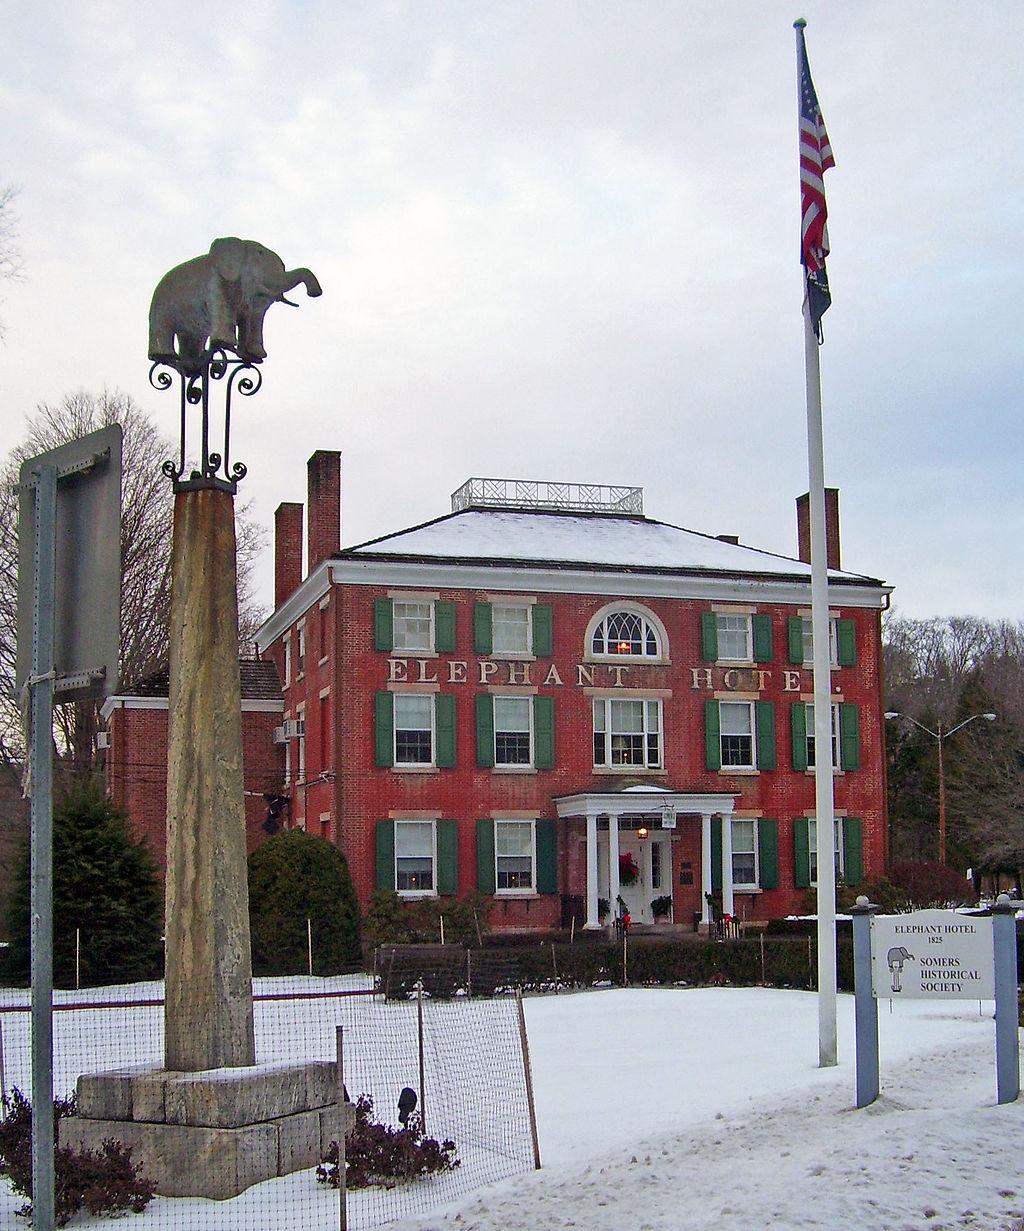 The Elephant Hotel. Source: Daniel Case @ the English Language Wikipedia